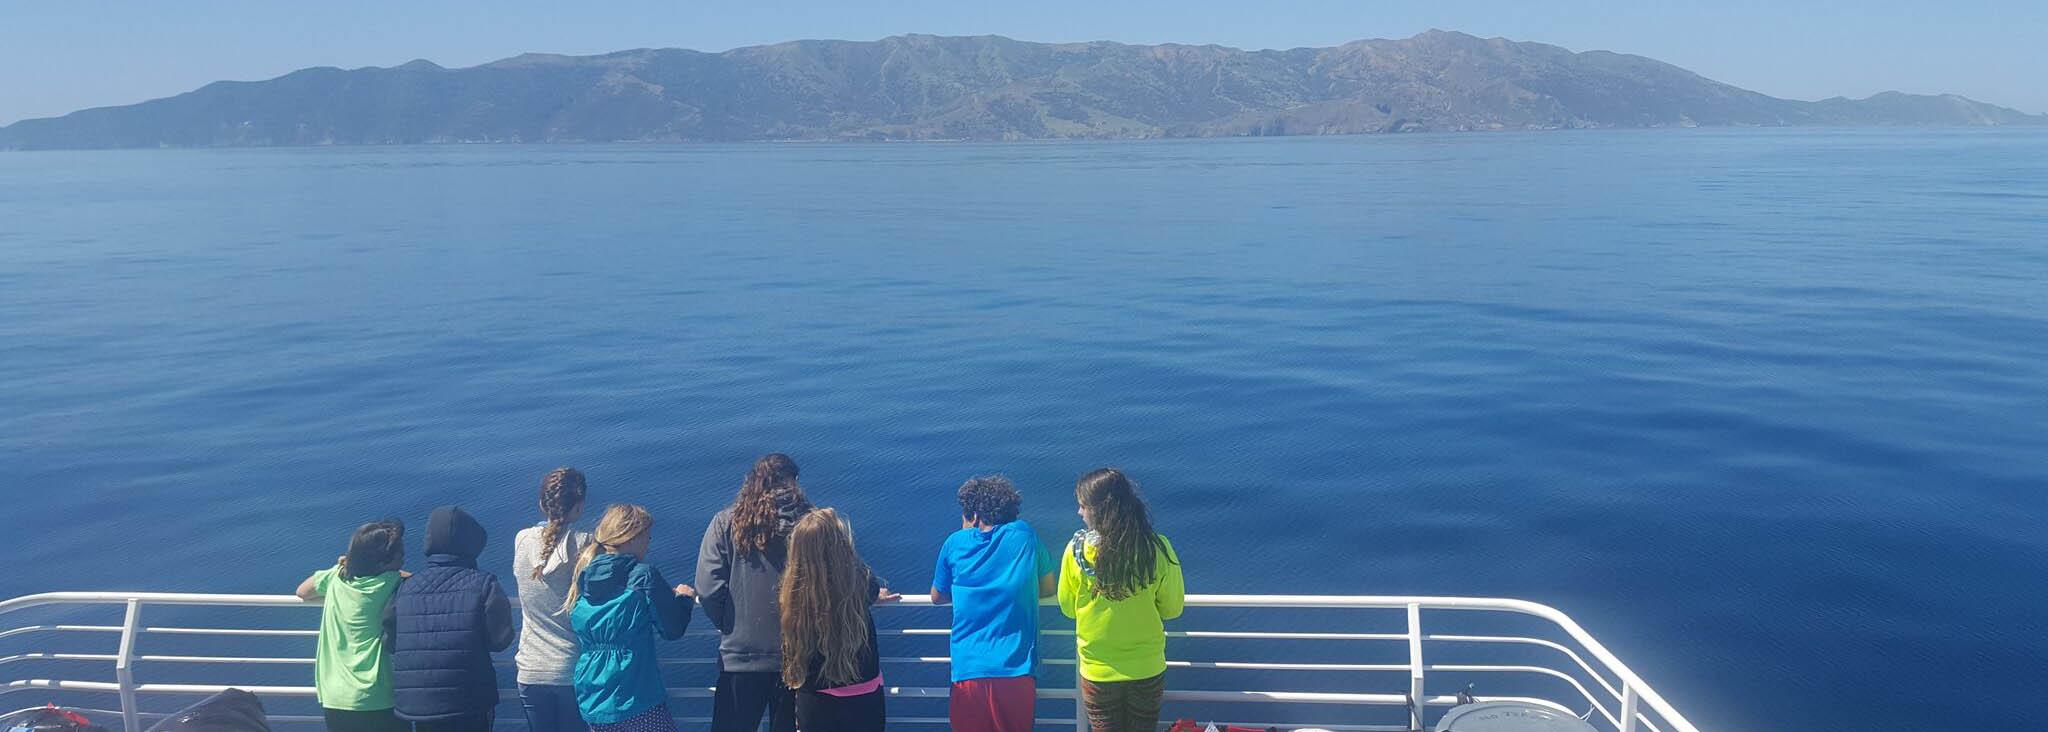 catalina-island-sea-camp-msa